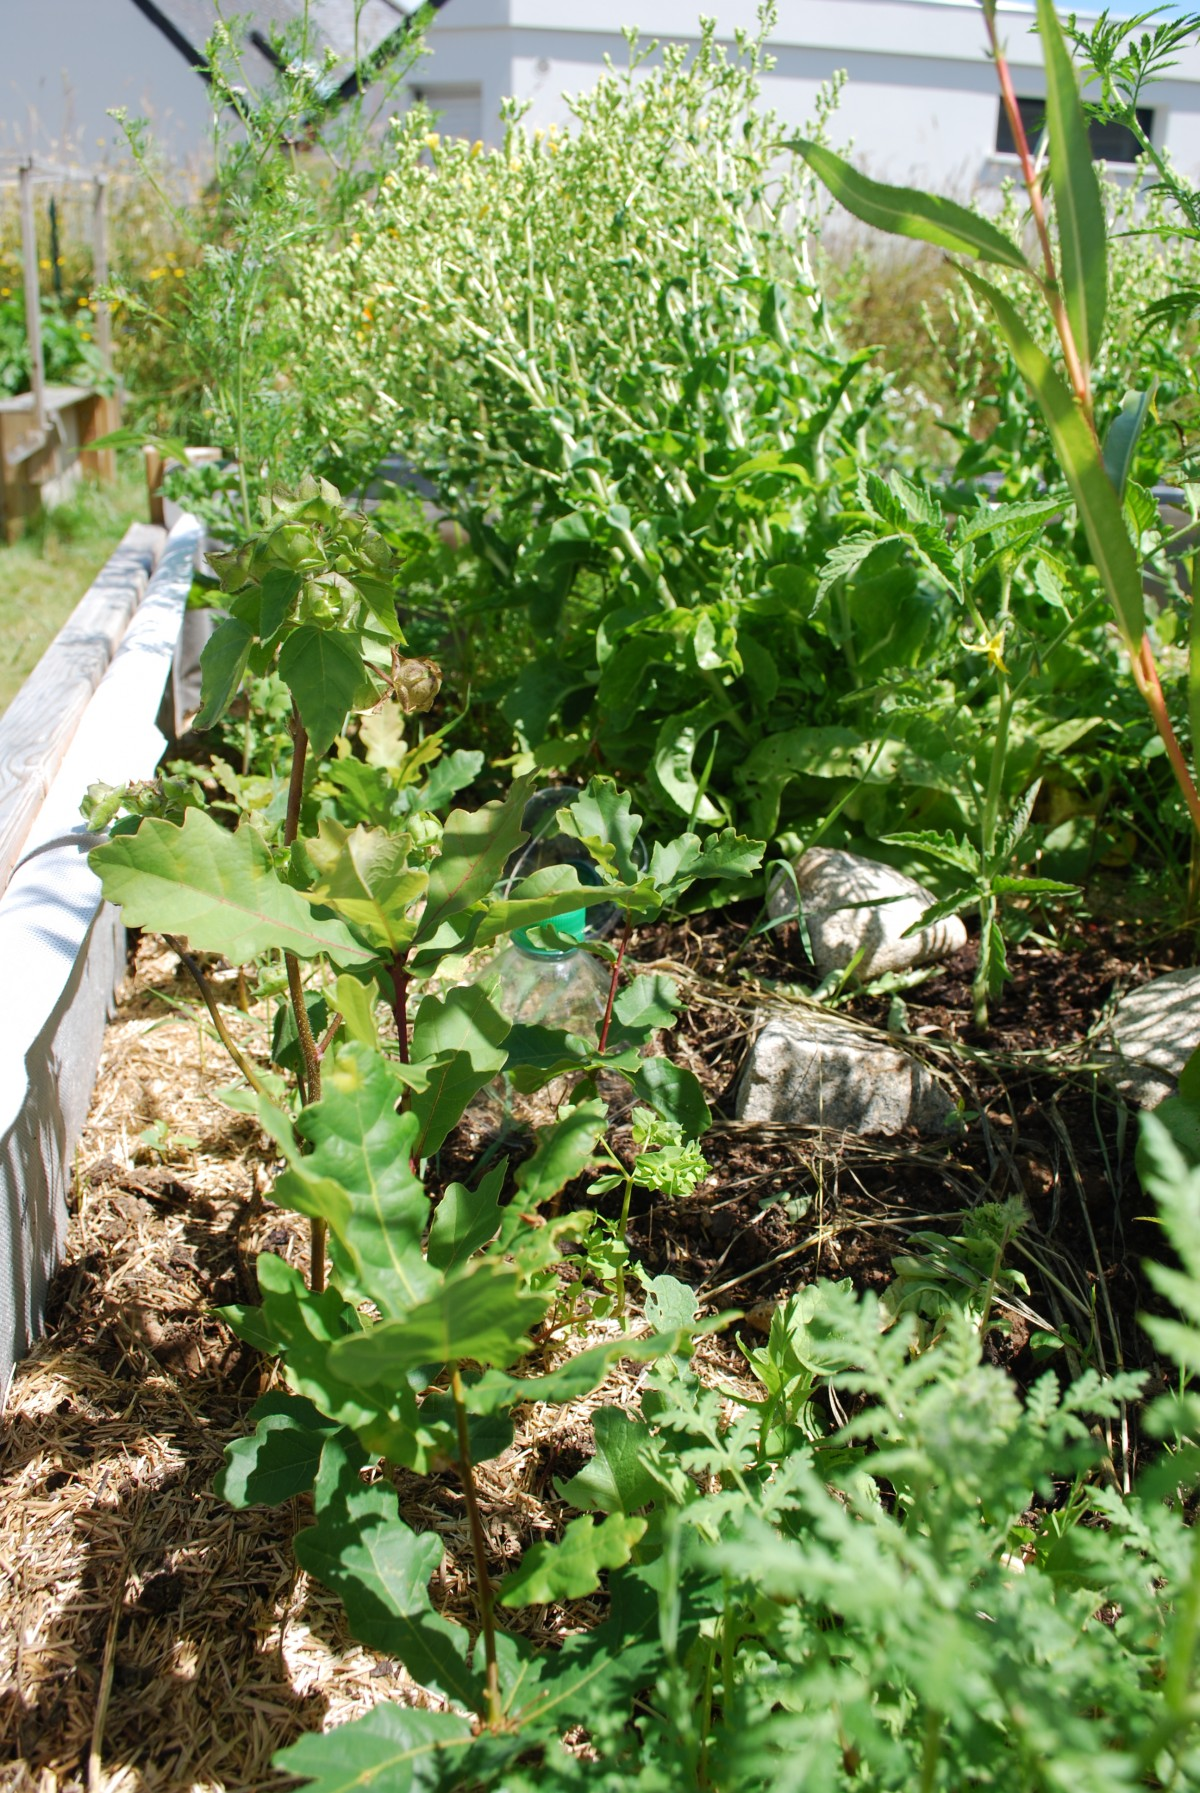 Jardin juillet 2014 permaculture for Jardin permaculture 2015